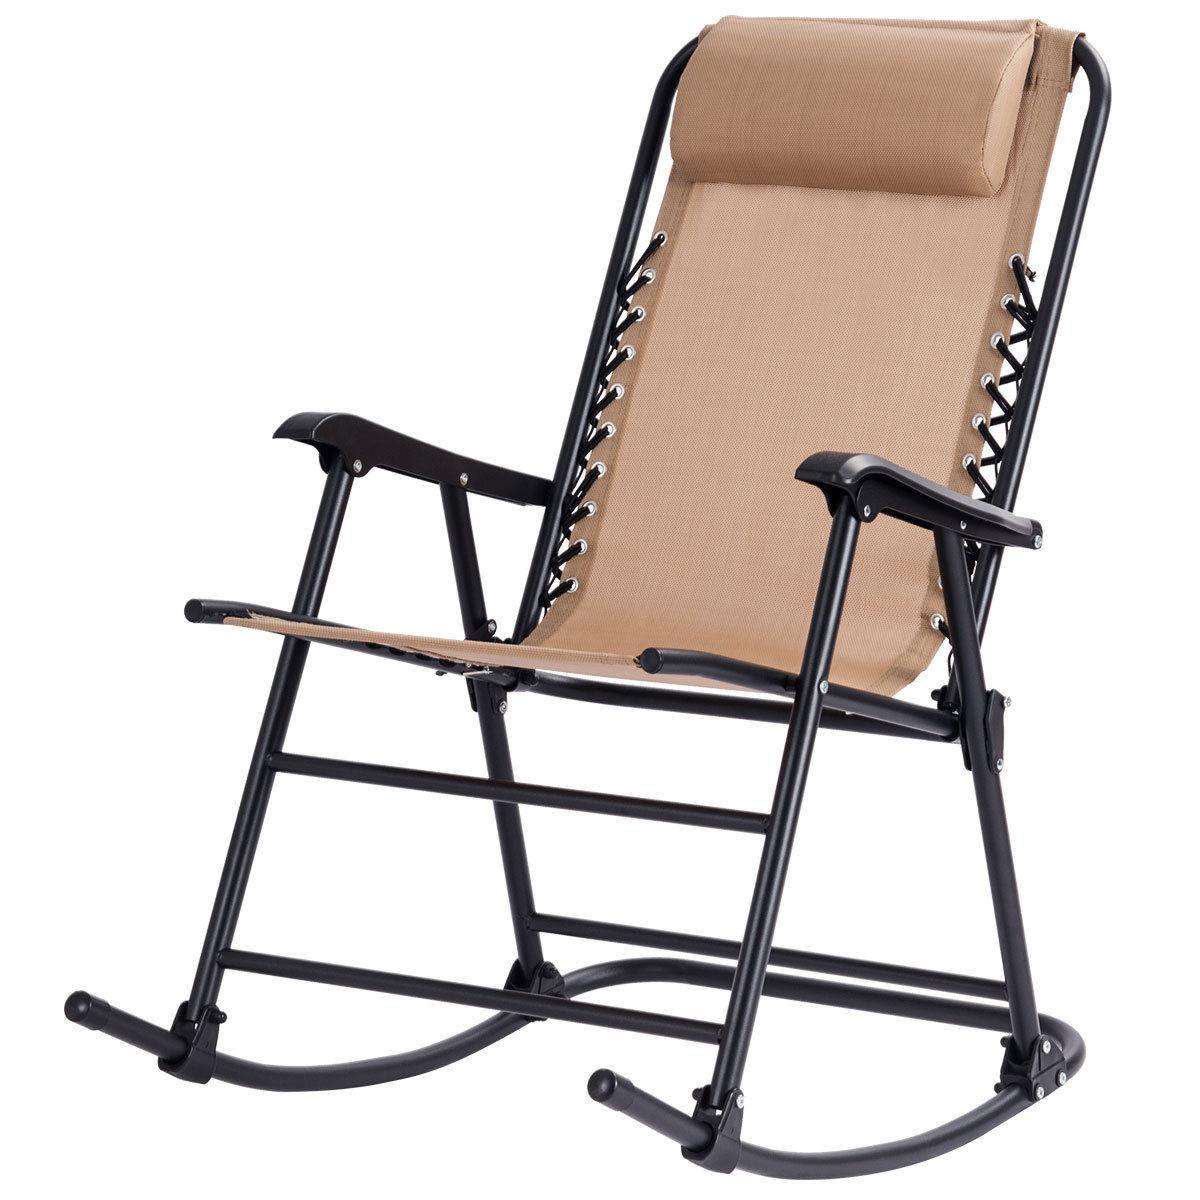 Costway Folding Zero Gravity Rocking Chair Rocker Porch Outdoor Patio Headrest Beige